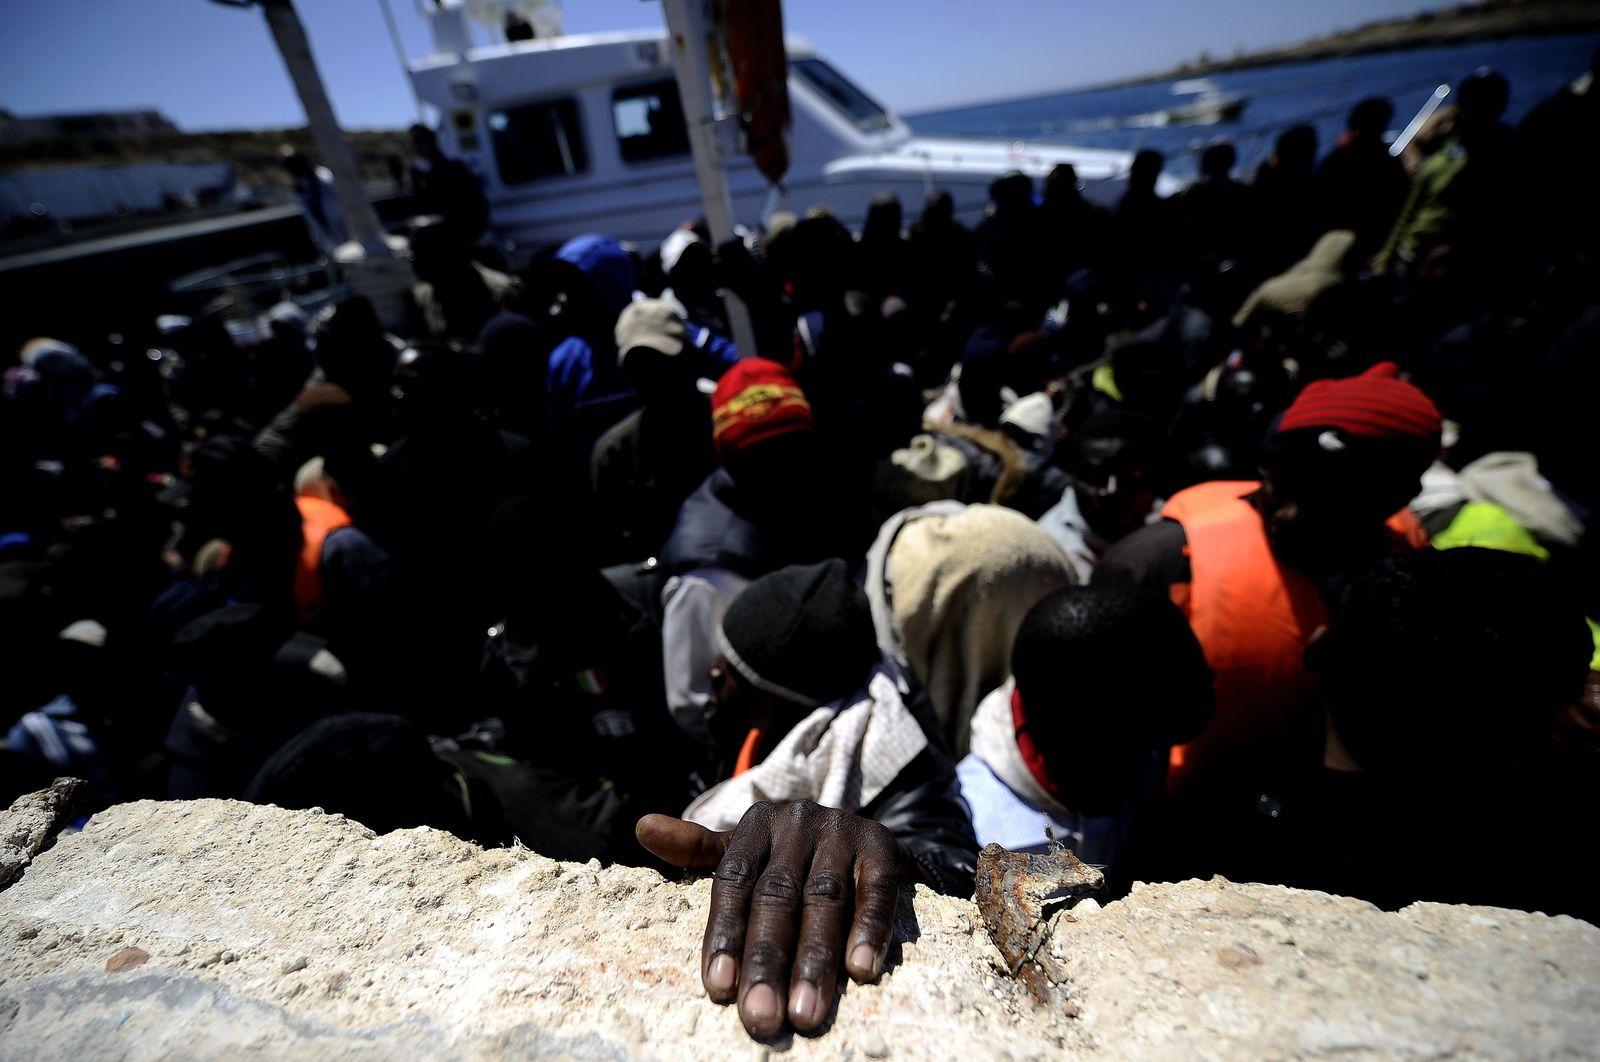 Einwanderer / Flüchtlinge / Lampedusa